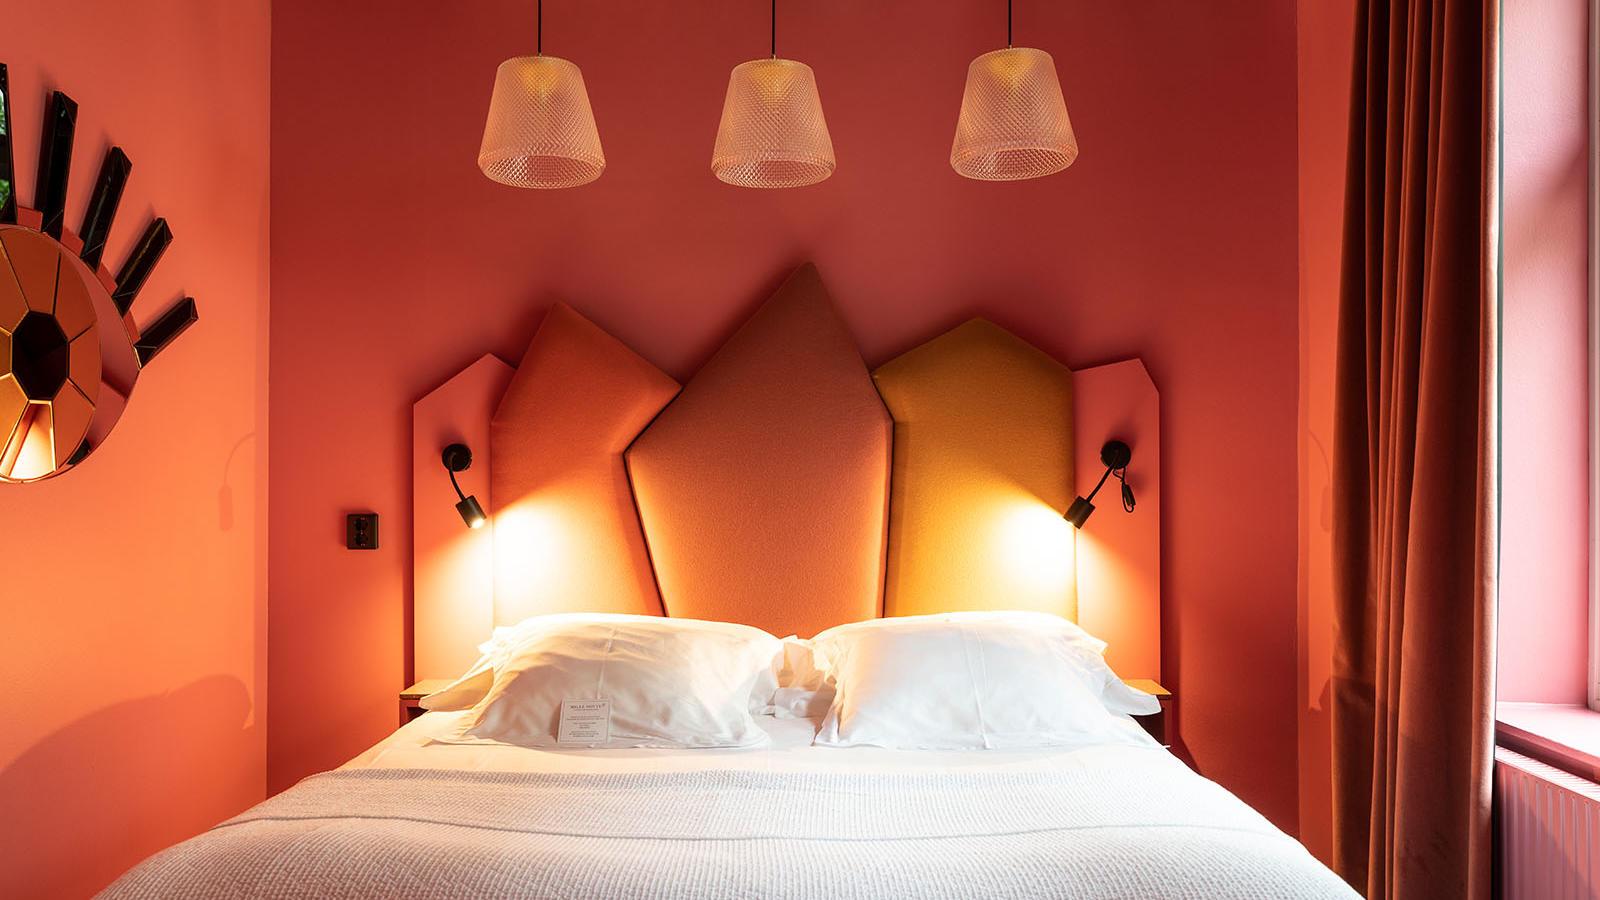 Small Room at Hotel Flora in Gothenburg, Sweden